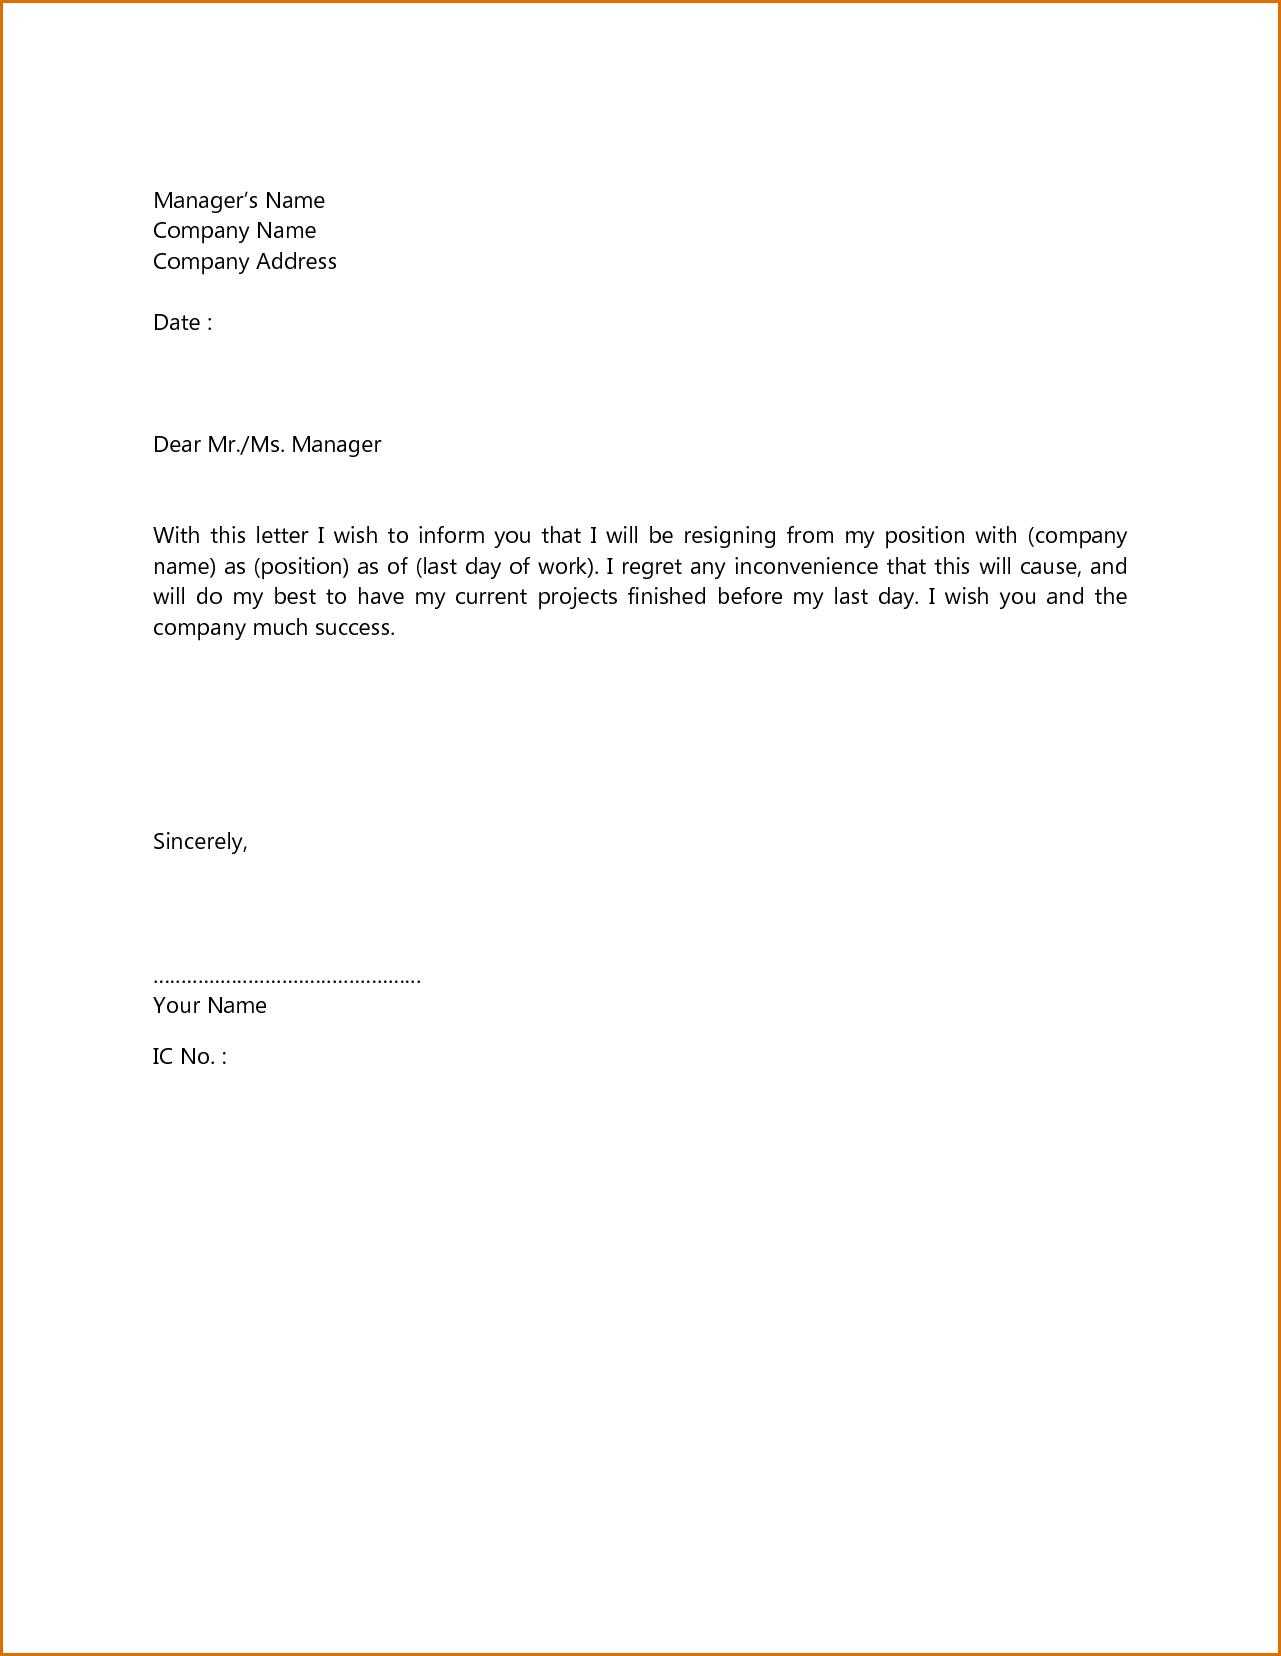 Simple Format Of Resignation Letter  Resume Layout 2017  resignation  Resignation letter Job